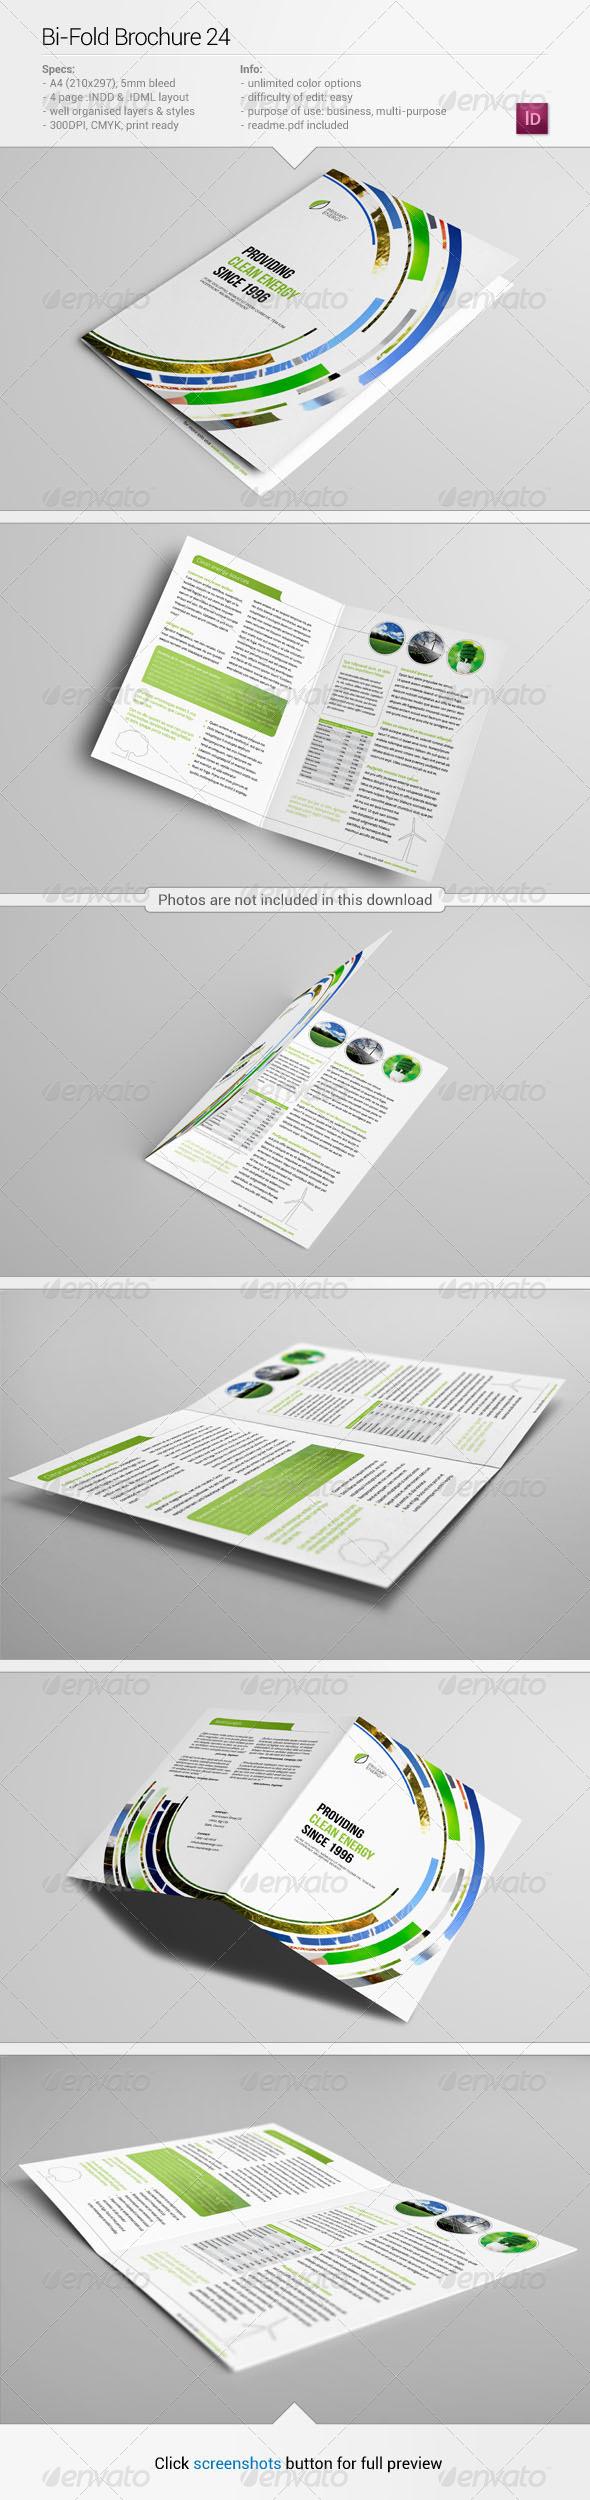 GraphicRiver Bi-Fold Brochure 24 5735270